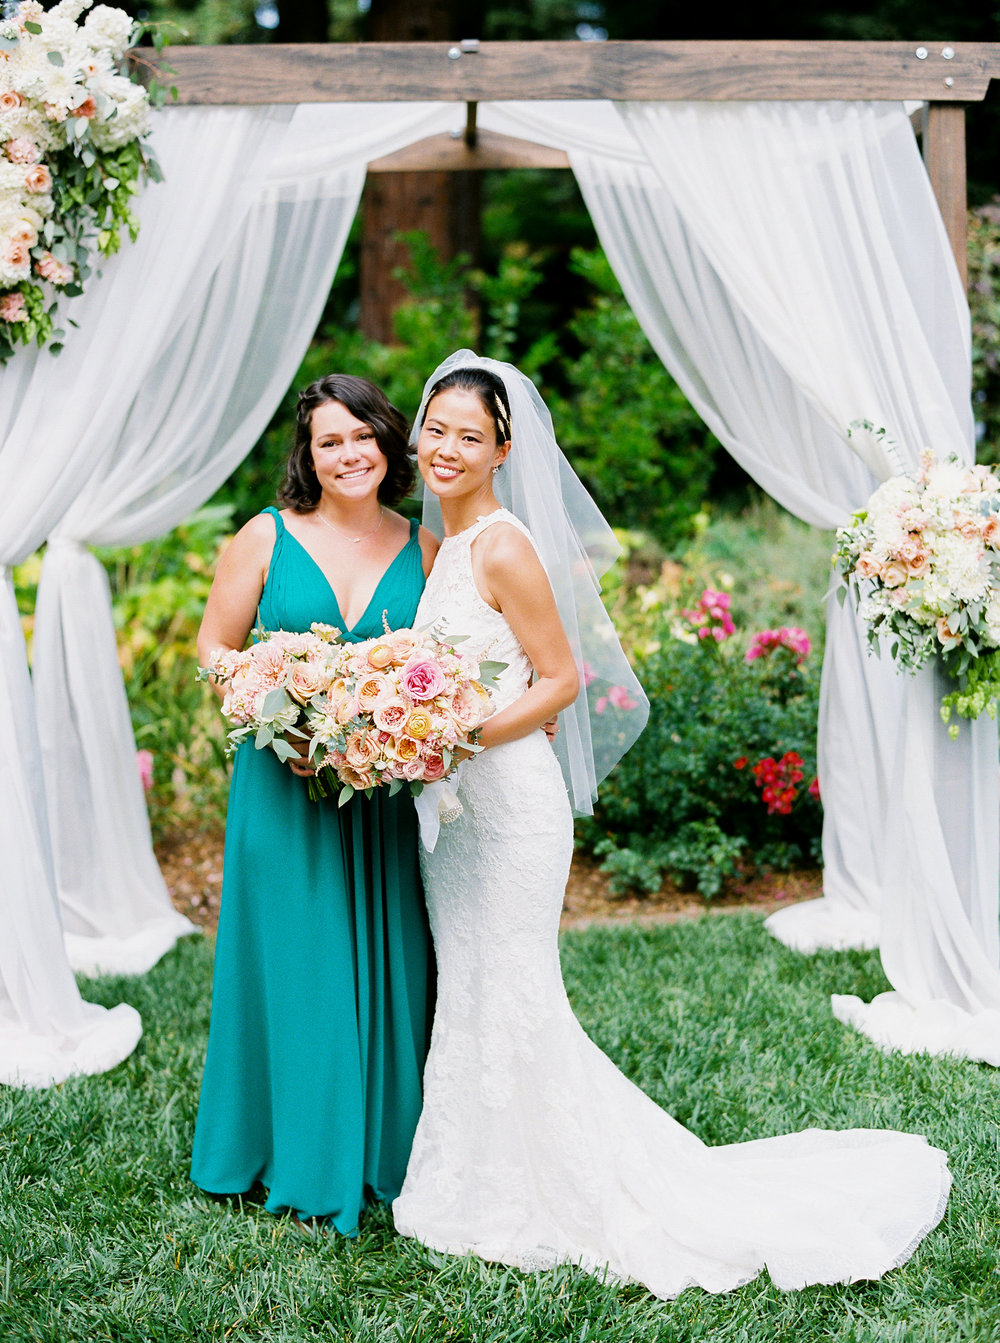 Harvest-inn-wedding-in-napa-california-41.jpg